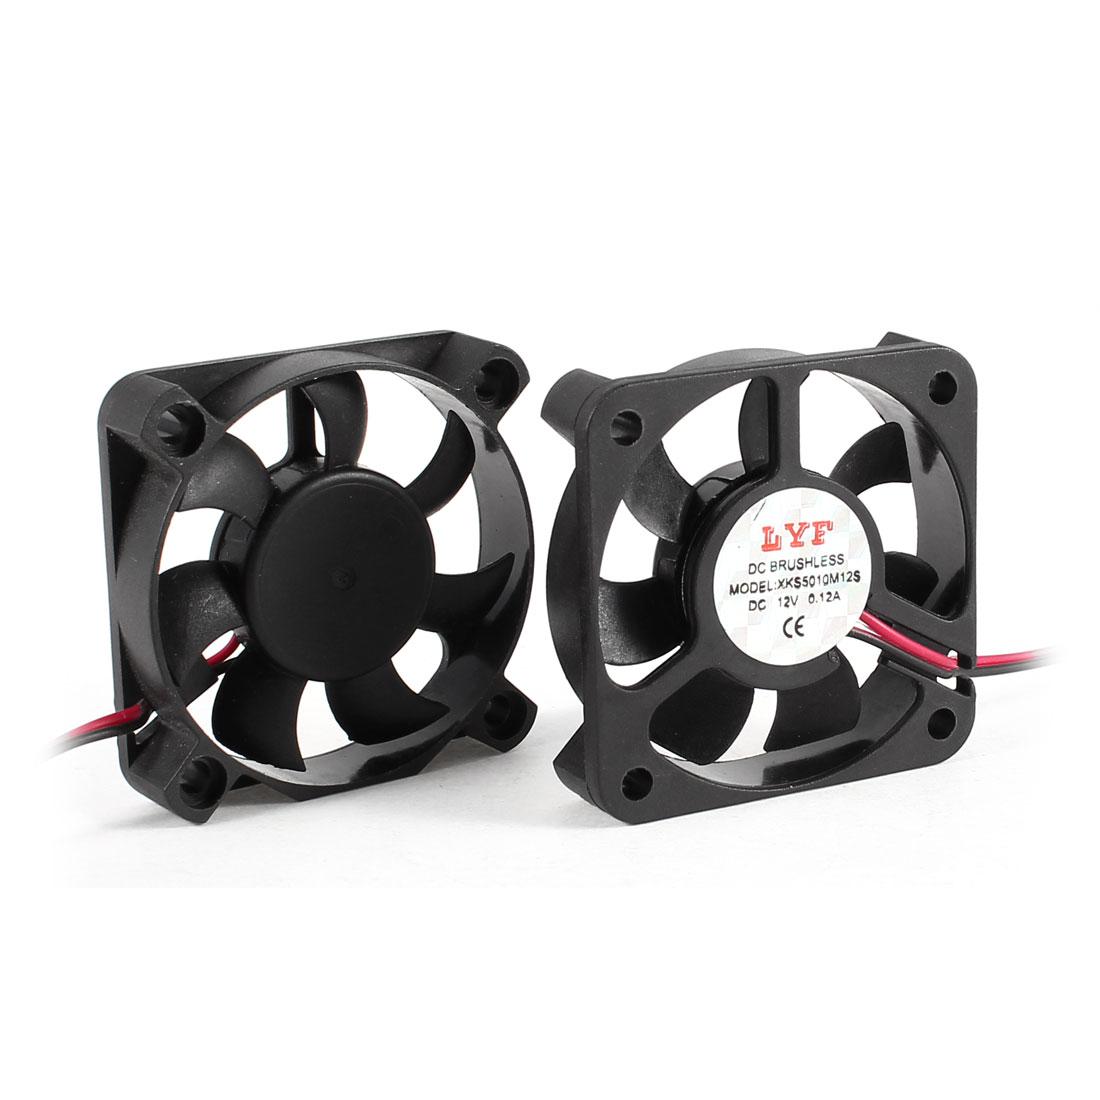 2 Pcs 2 Pole 50mm Square Computer CPU Cooling Fan Cooler Black